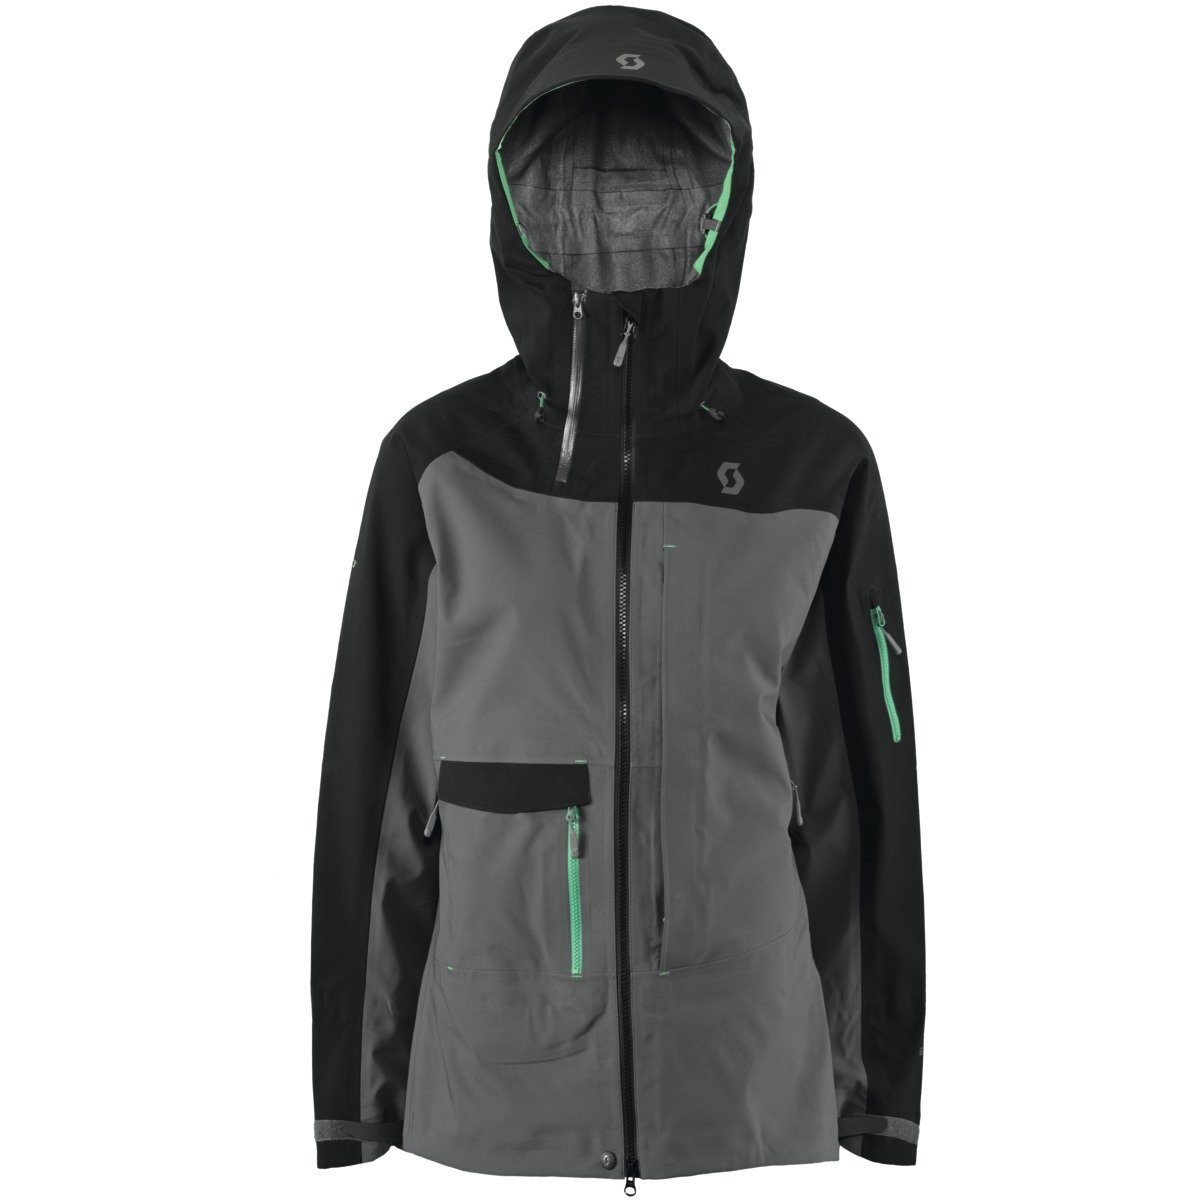 Damen Snowboard Jacke Scott Jebel Jacket günstig